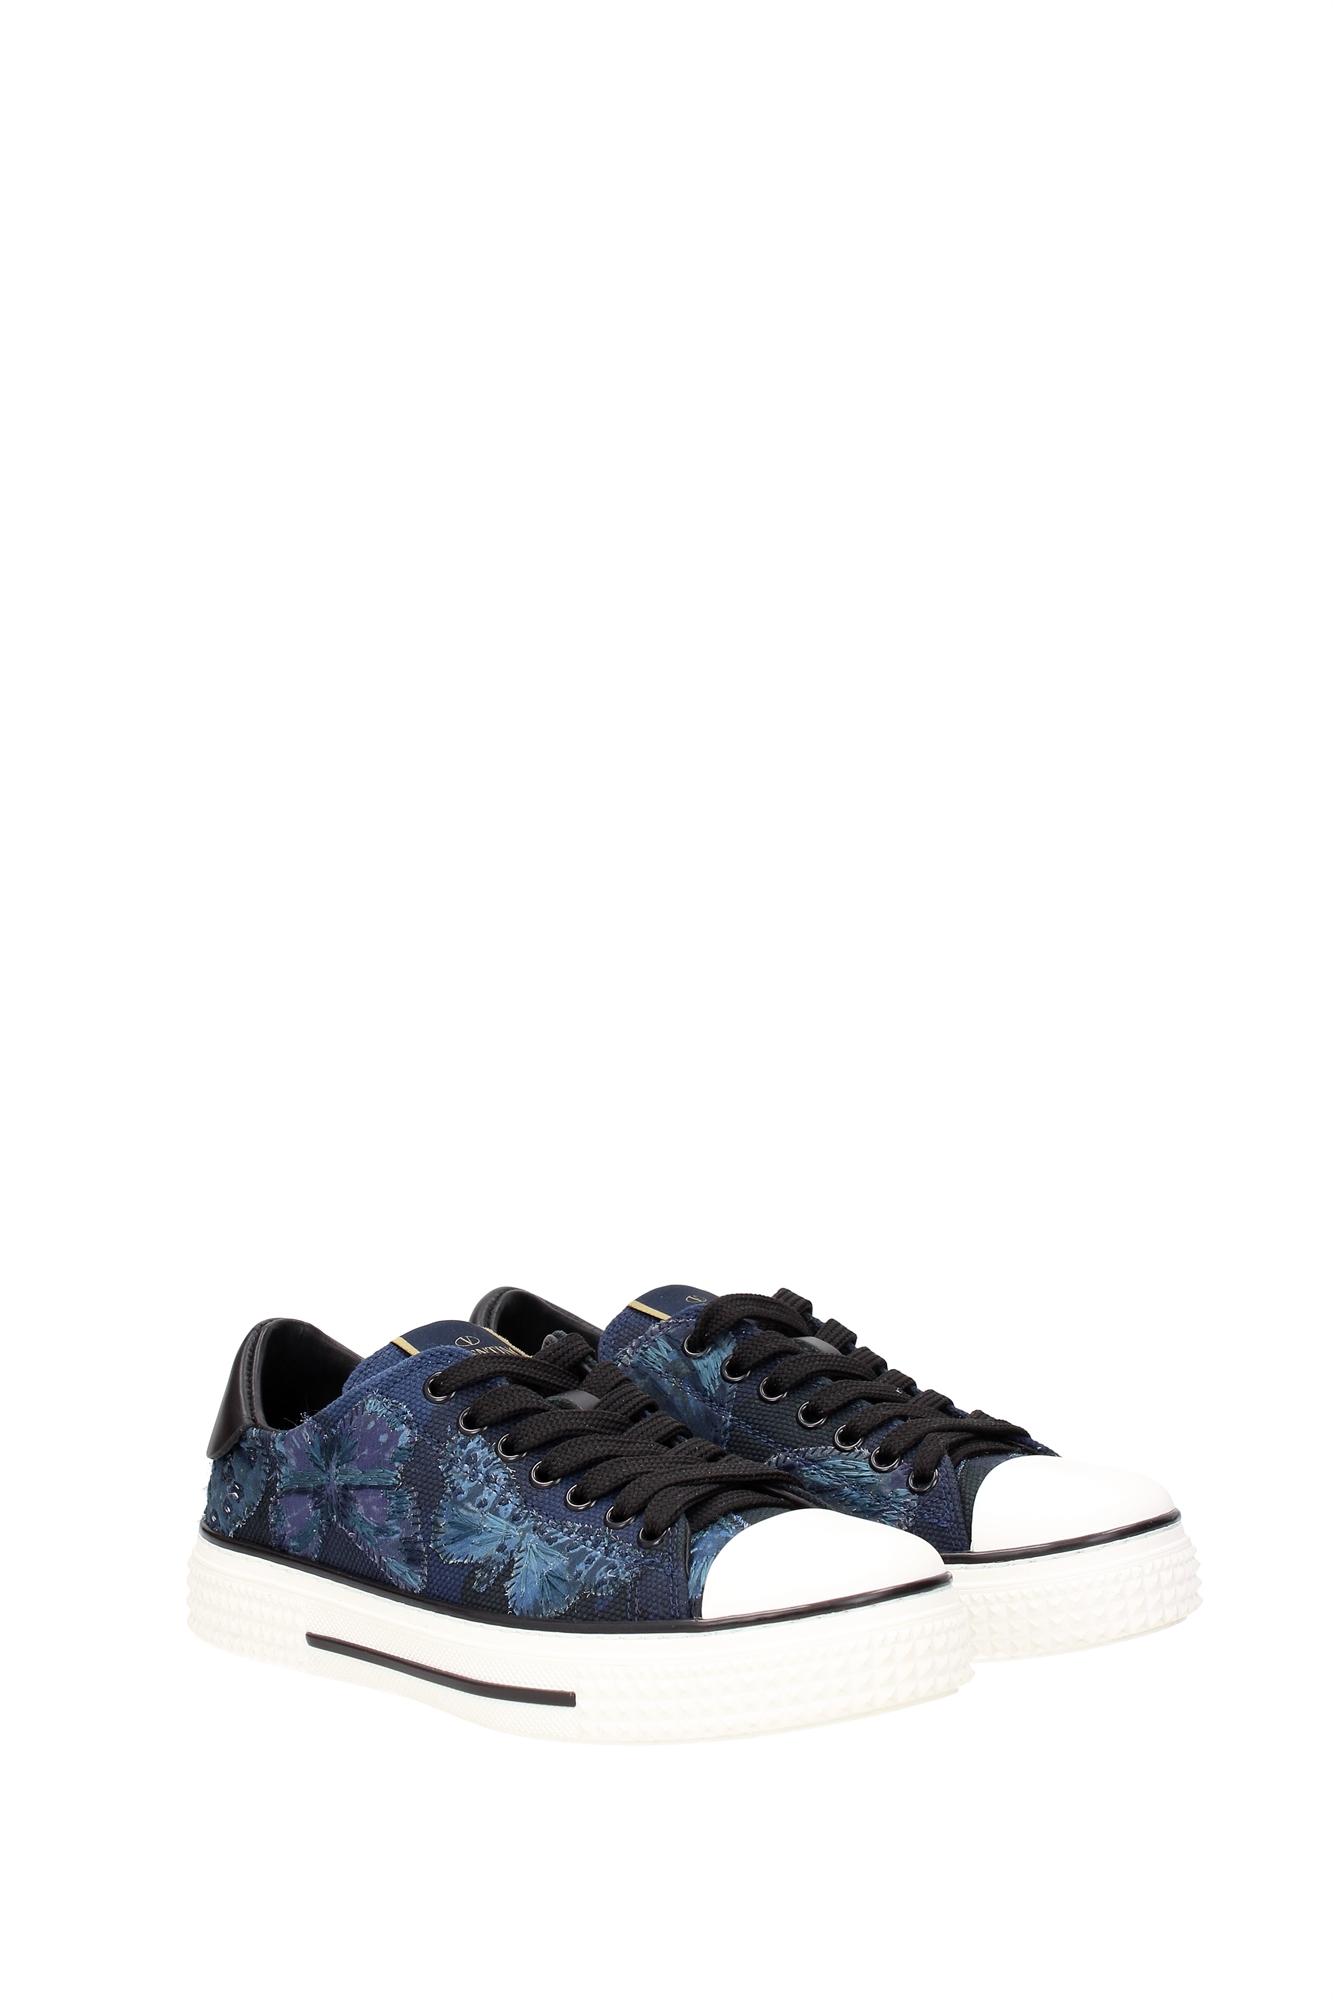 sneakers valentino garavani women fabric blue kw2s0019crmm74 ebay. Black Bedroom Furniture Sets. Home Design Ideas